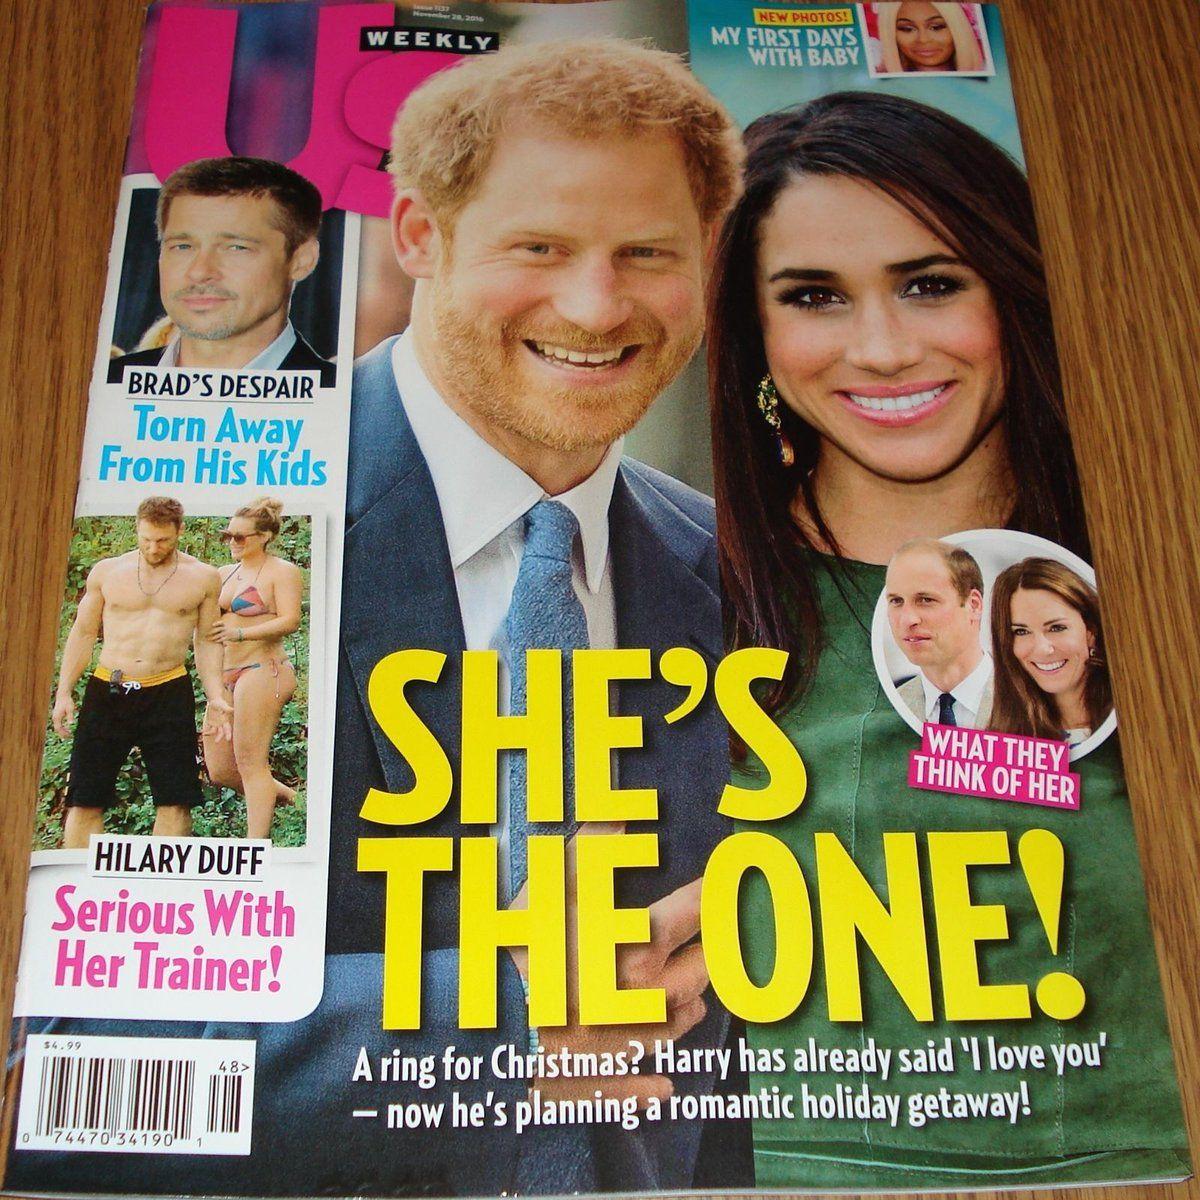 #Popular - Prince Harry Brad Pitt Eddie Redmayne Joe Jonas Khloe Kardashian Jessica Biel  http://dlvr.it/MlVh0J - http://Ebaypic.twitter.com/bqYspv3OP4